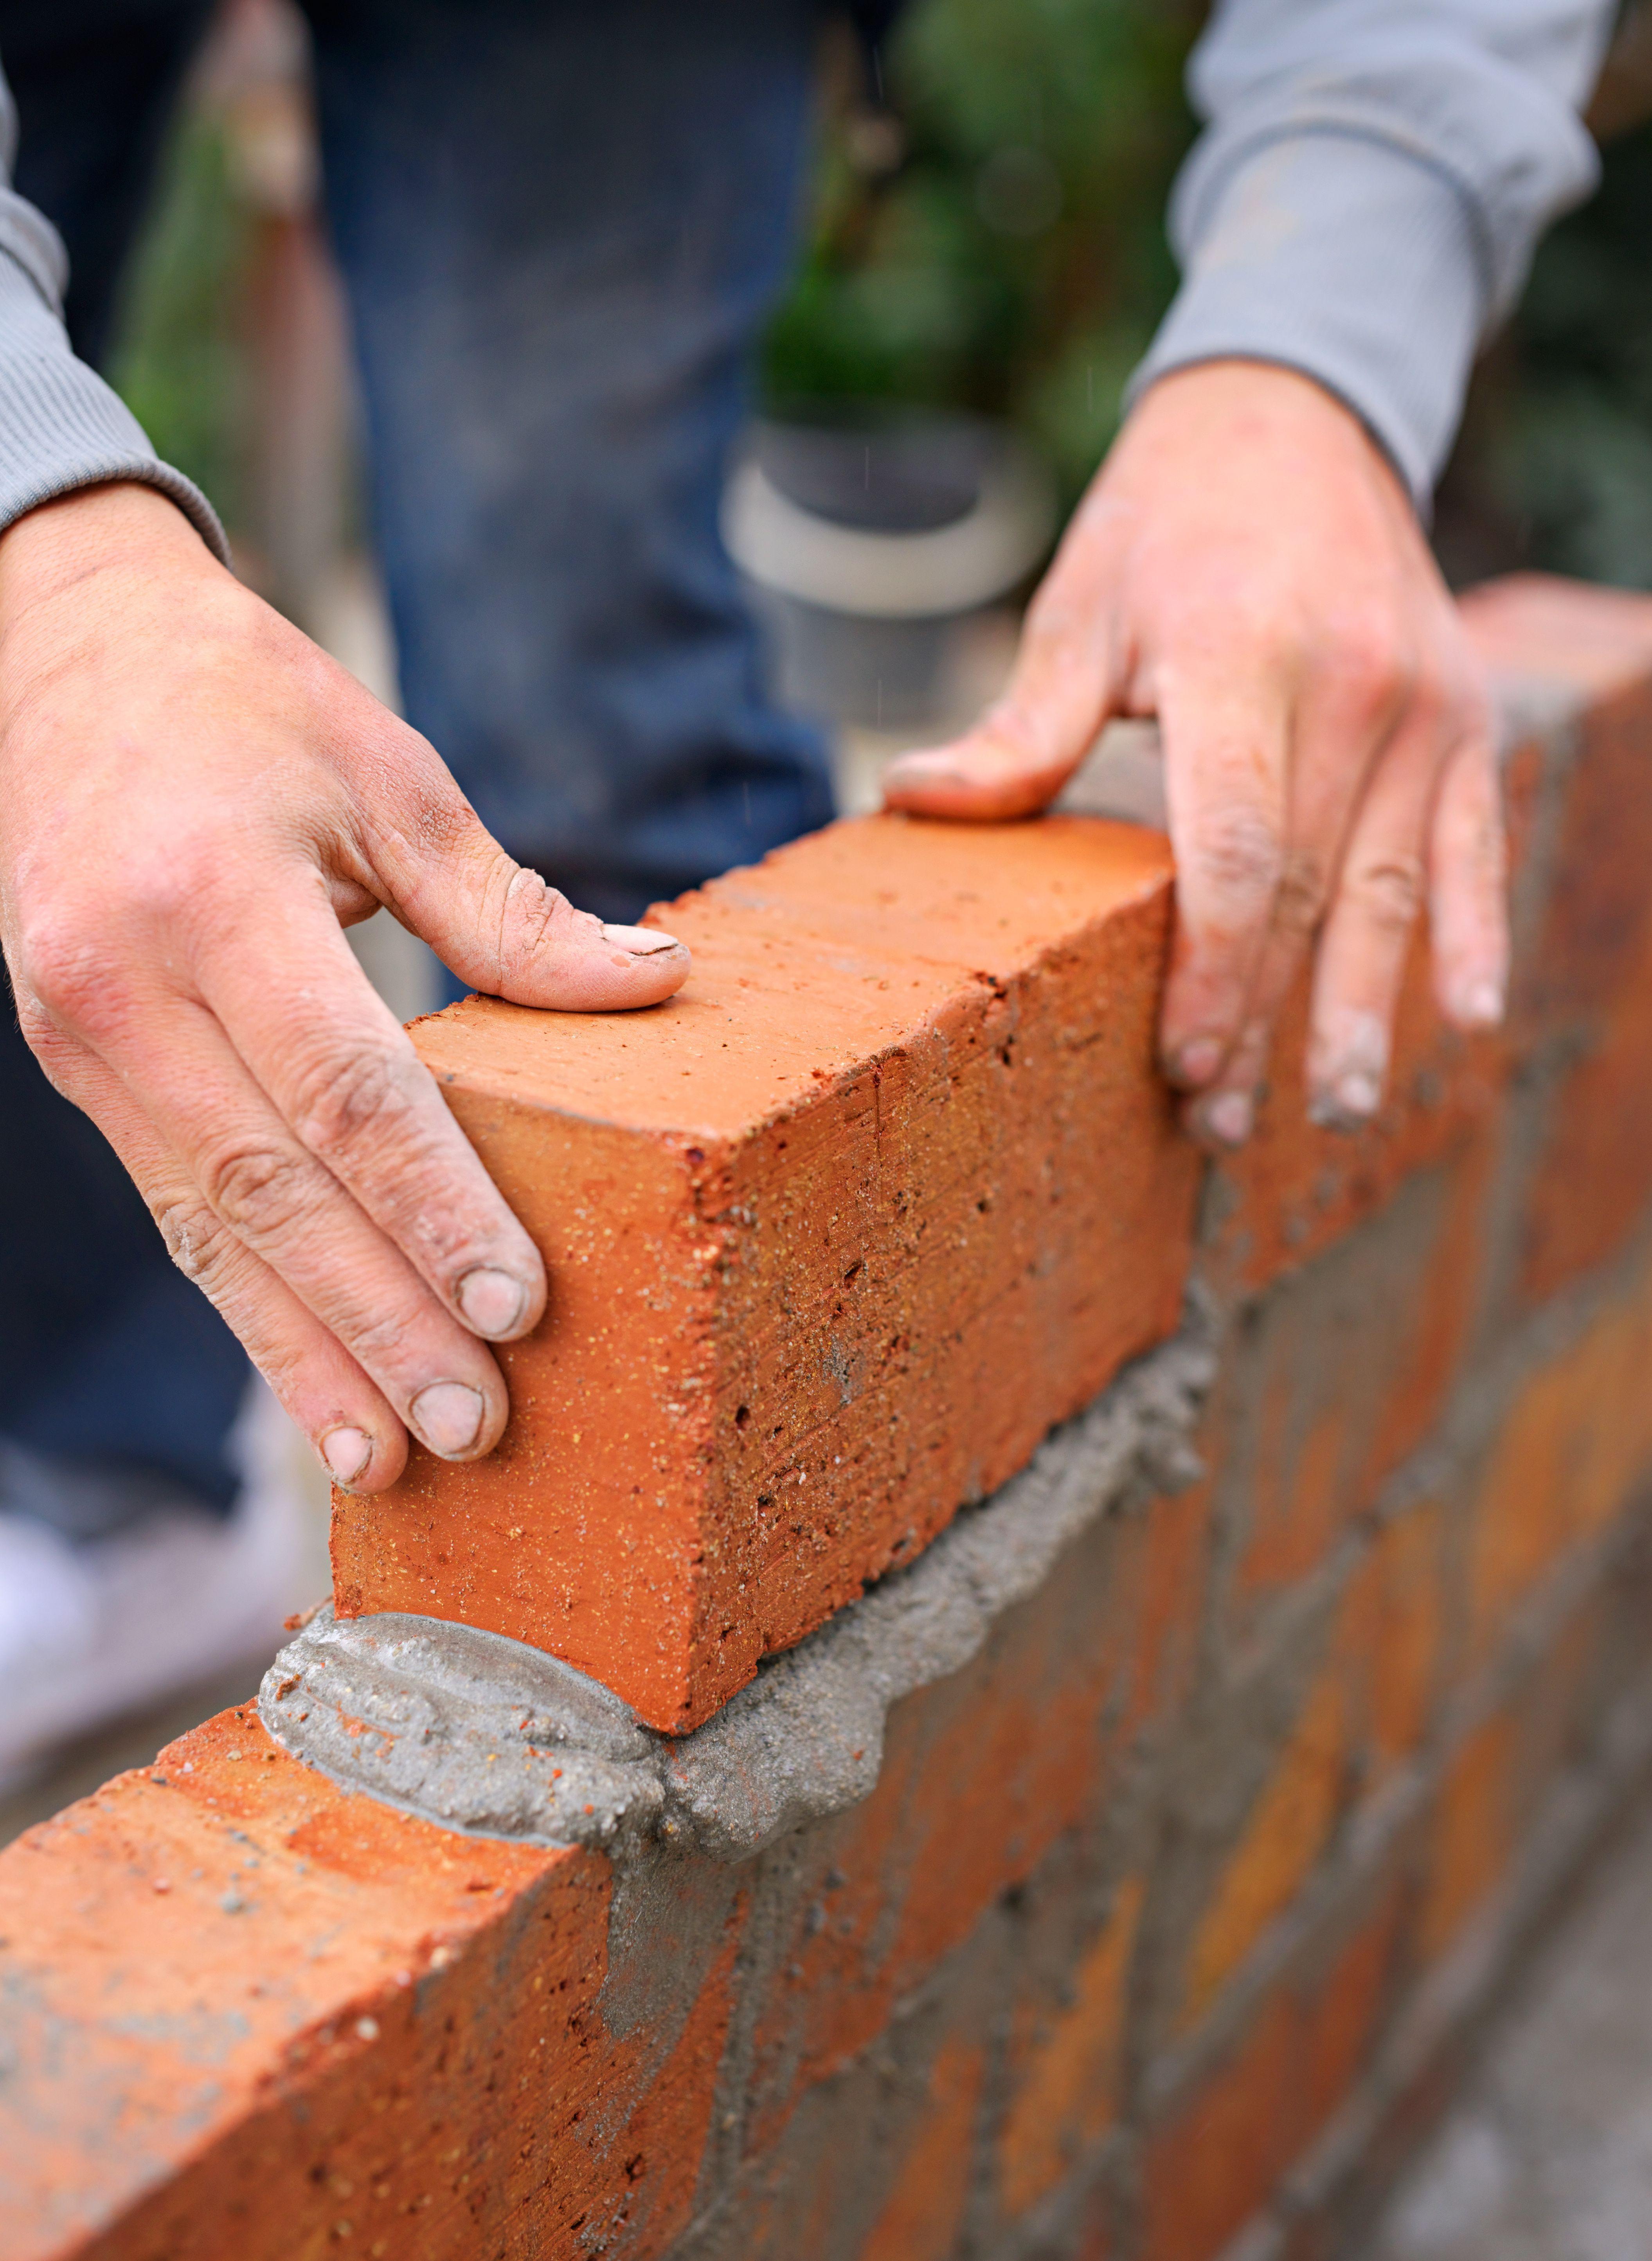 Easy Guide To Choosing Mortar Mix Mortar Concrete Block Walls Faux Walls